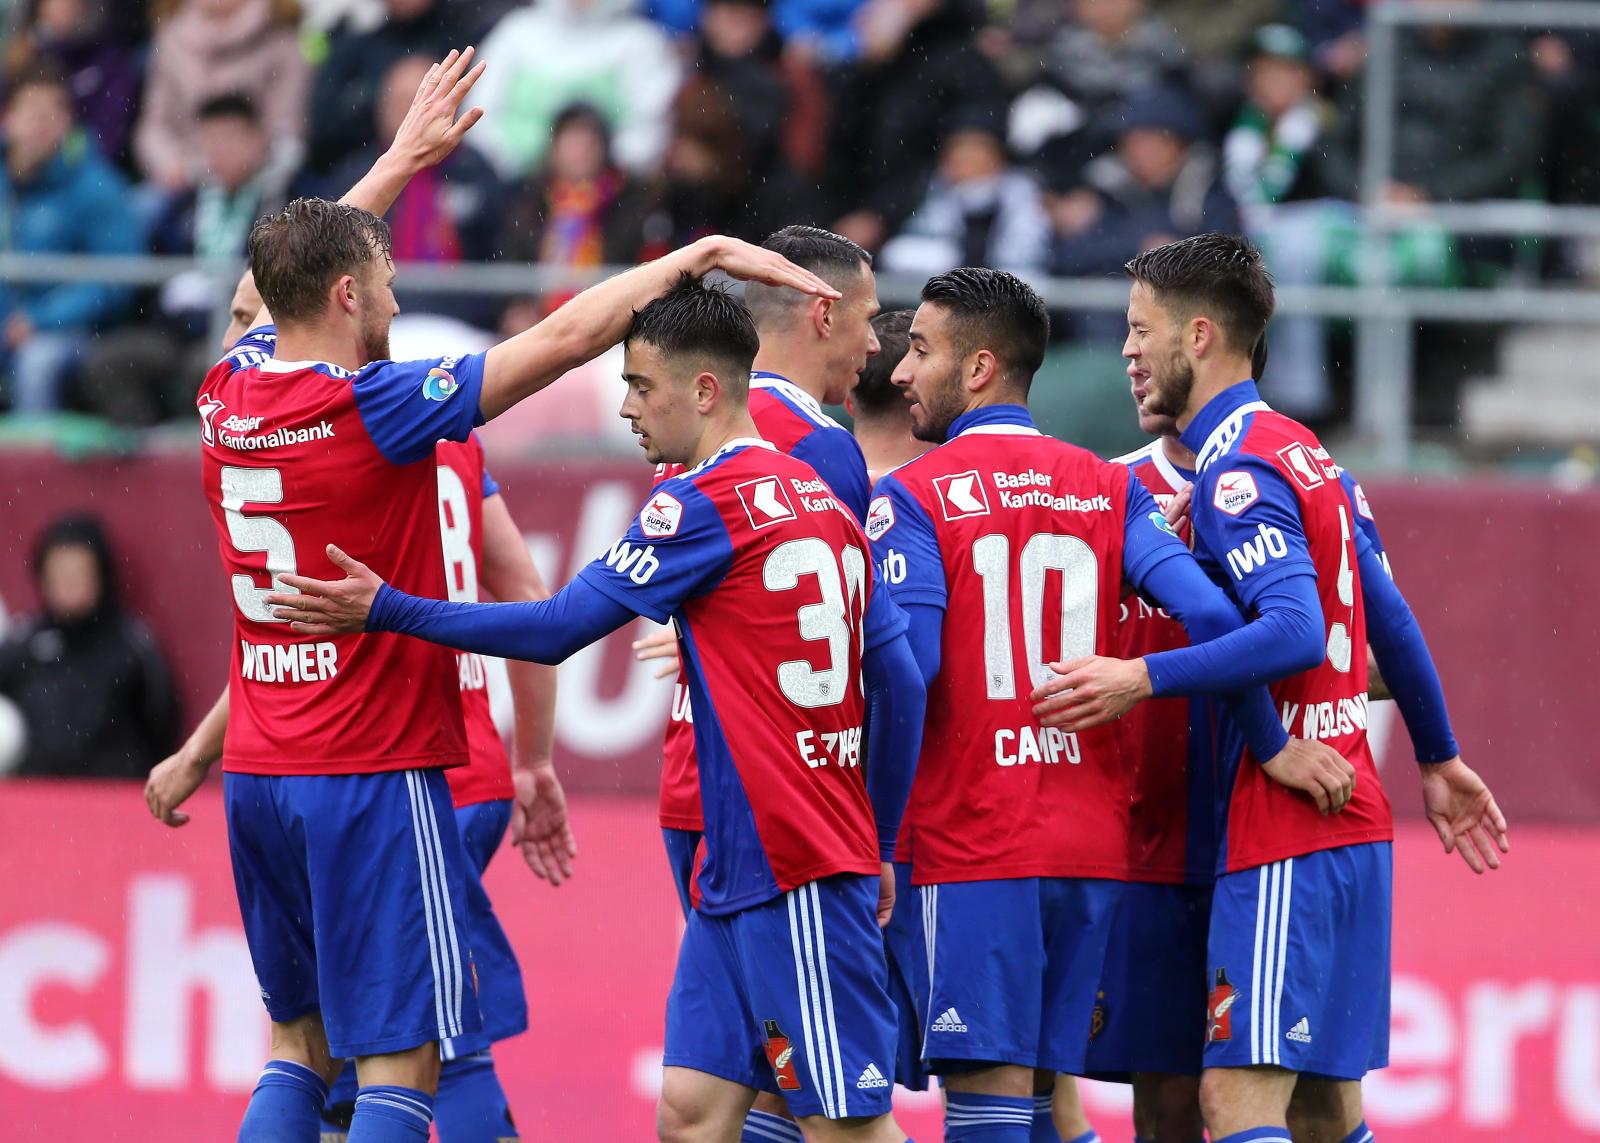 soi-keo-ca-cuoc-bong-da-ngay-7-11-Basel-vs-club-brugge-lay-ve-di-tiep-b9 2